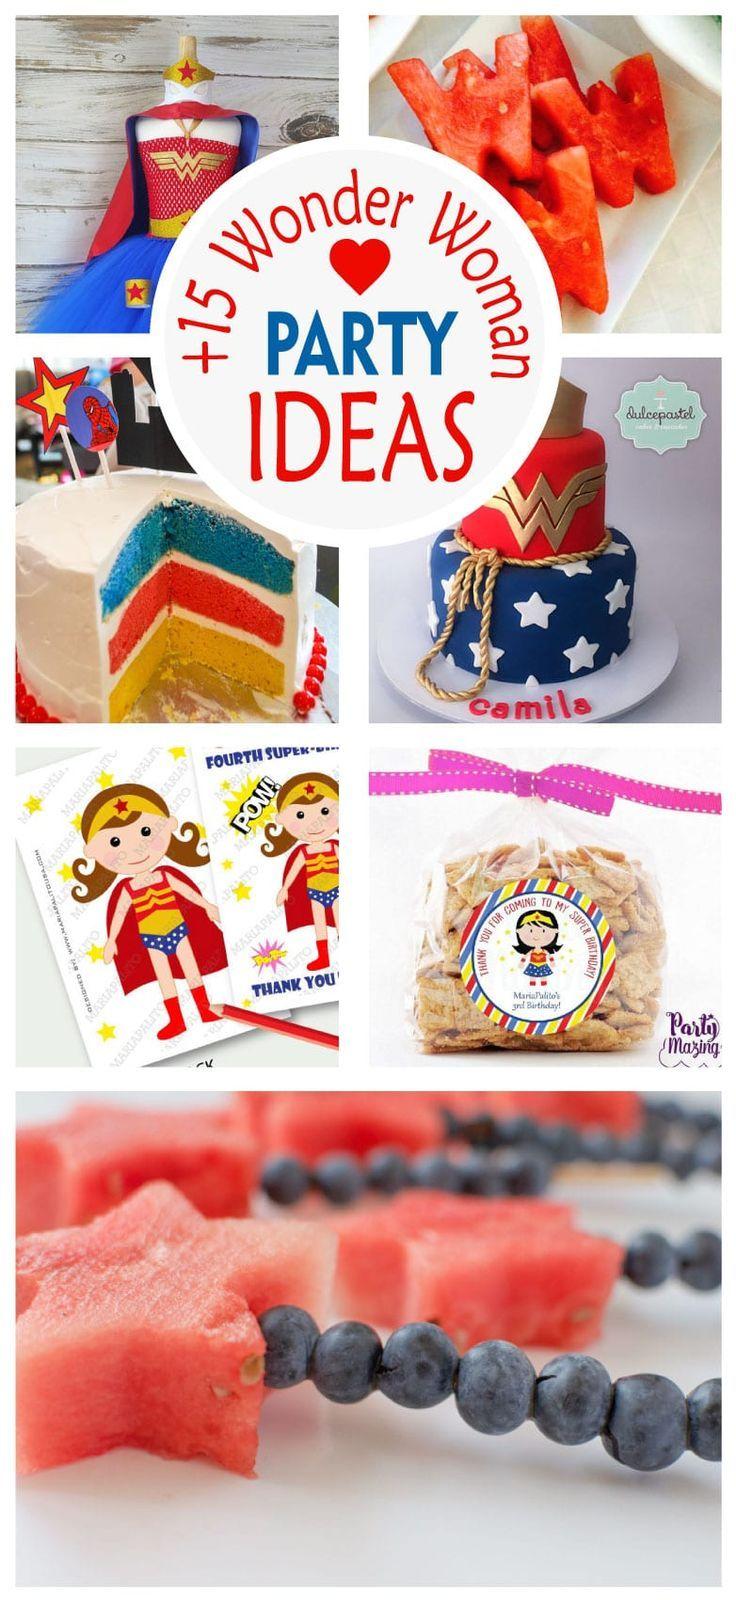 57 Best Wonder Woman Party Ideas Images On Pinterest -3874